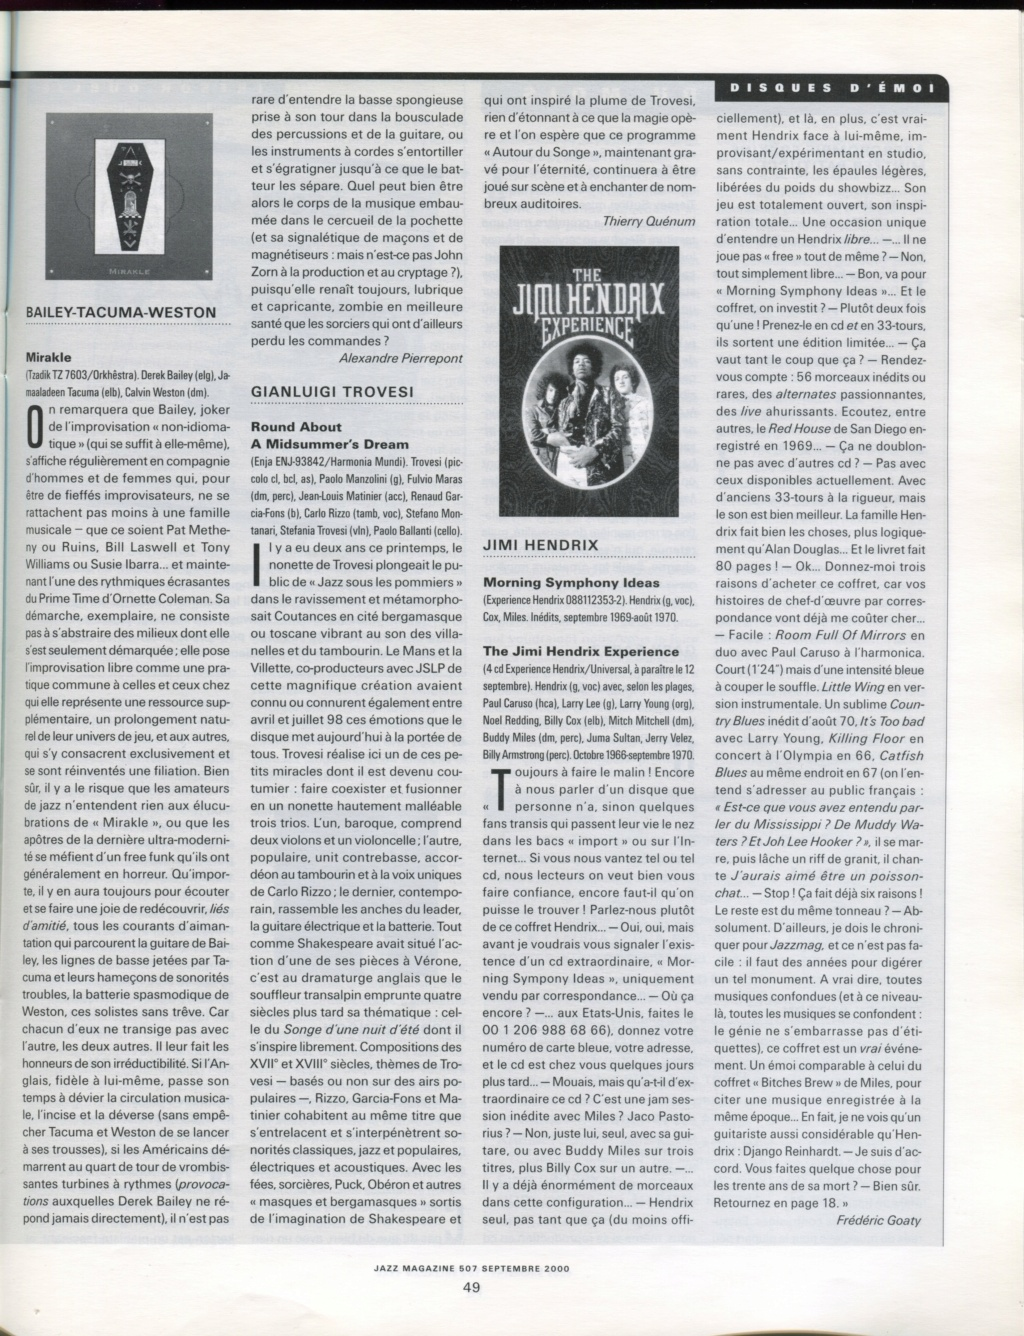 Magazines Français 1989 - 2014 - Page 2 1990_148